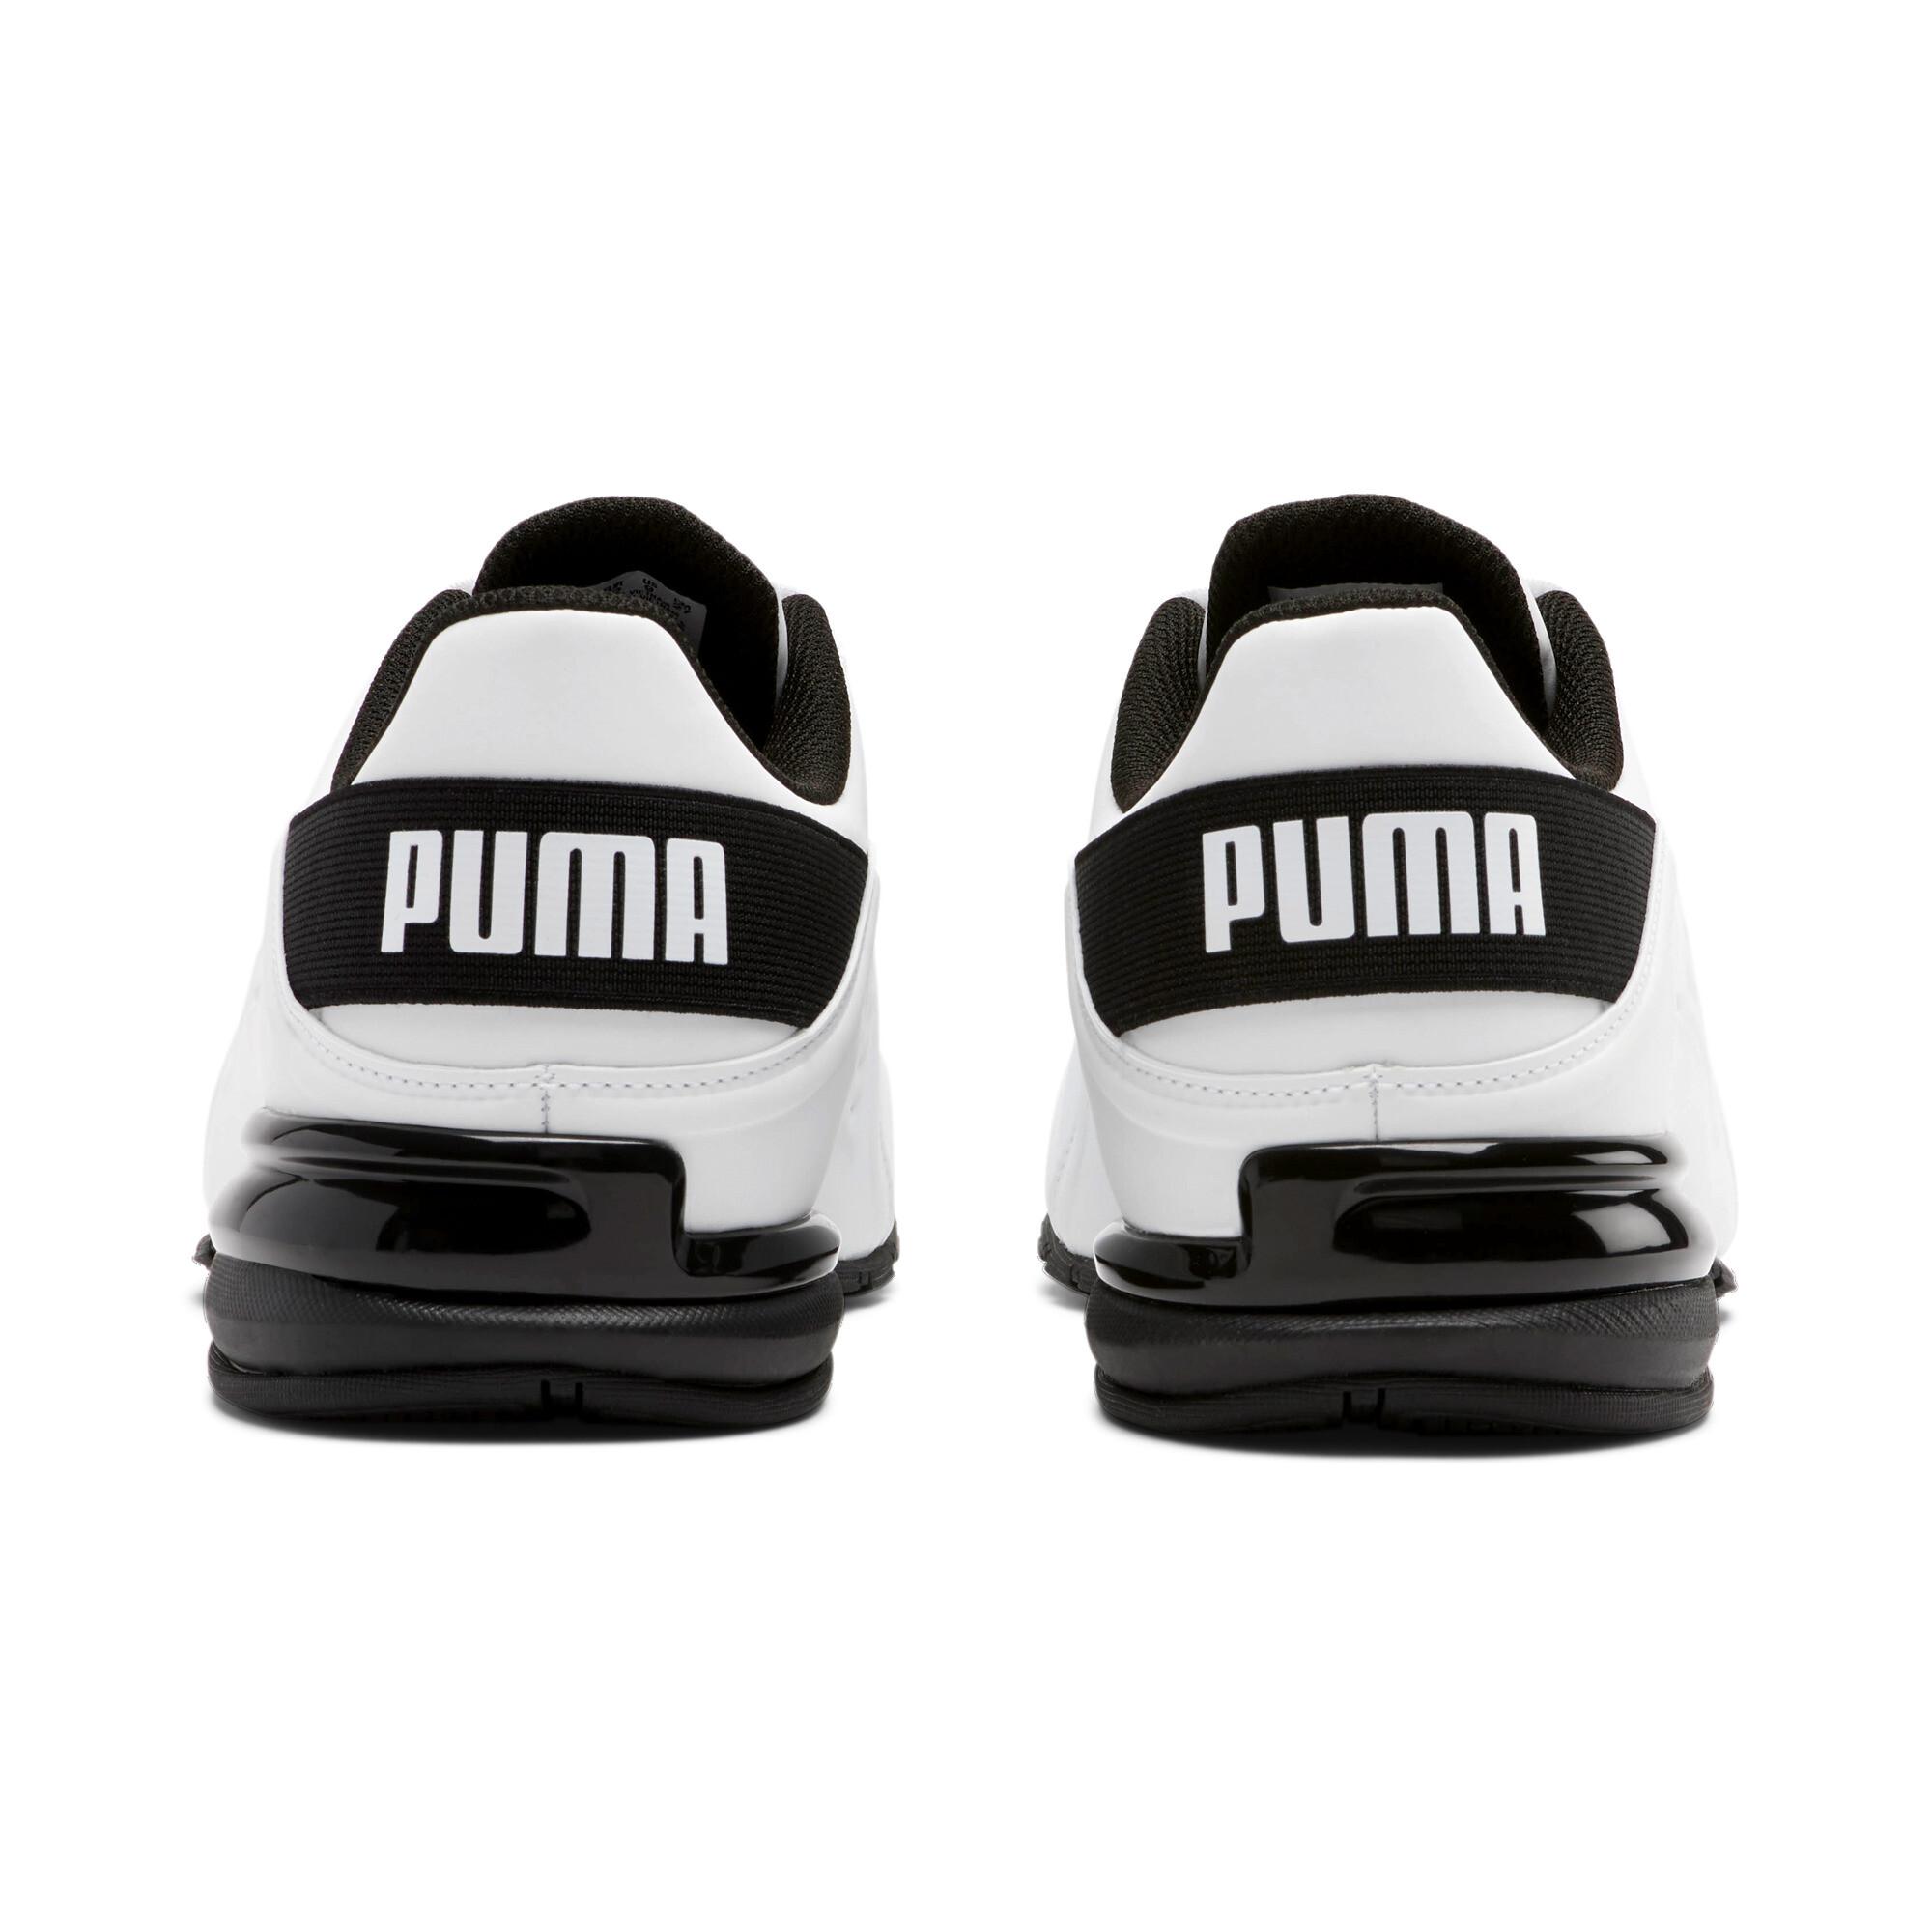 PUMA-Men-039-s-Viz-Runner-Wide-Shoes thumbnail 3